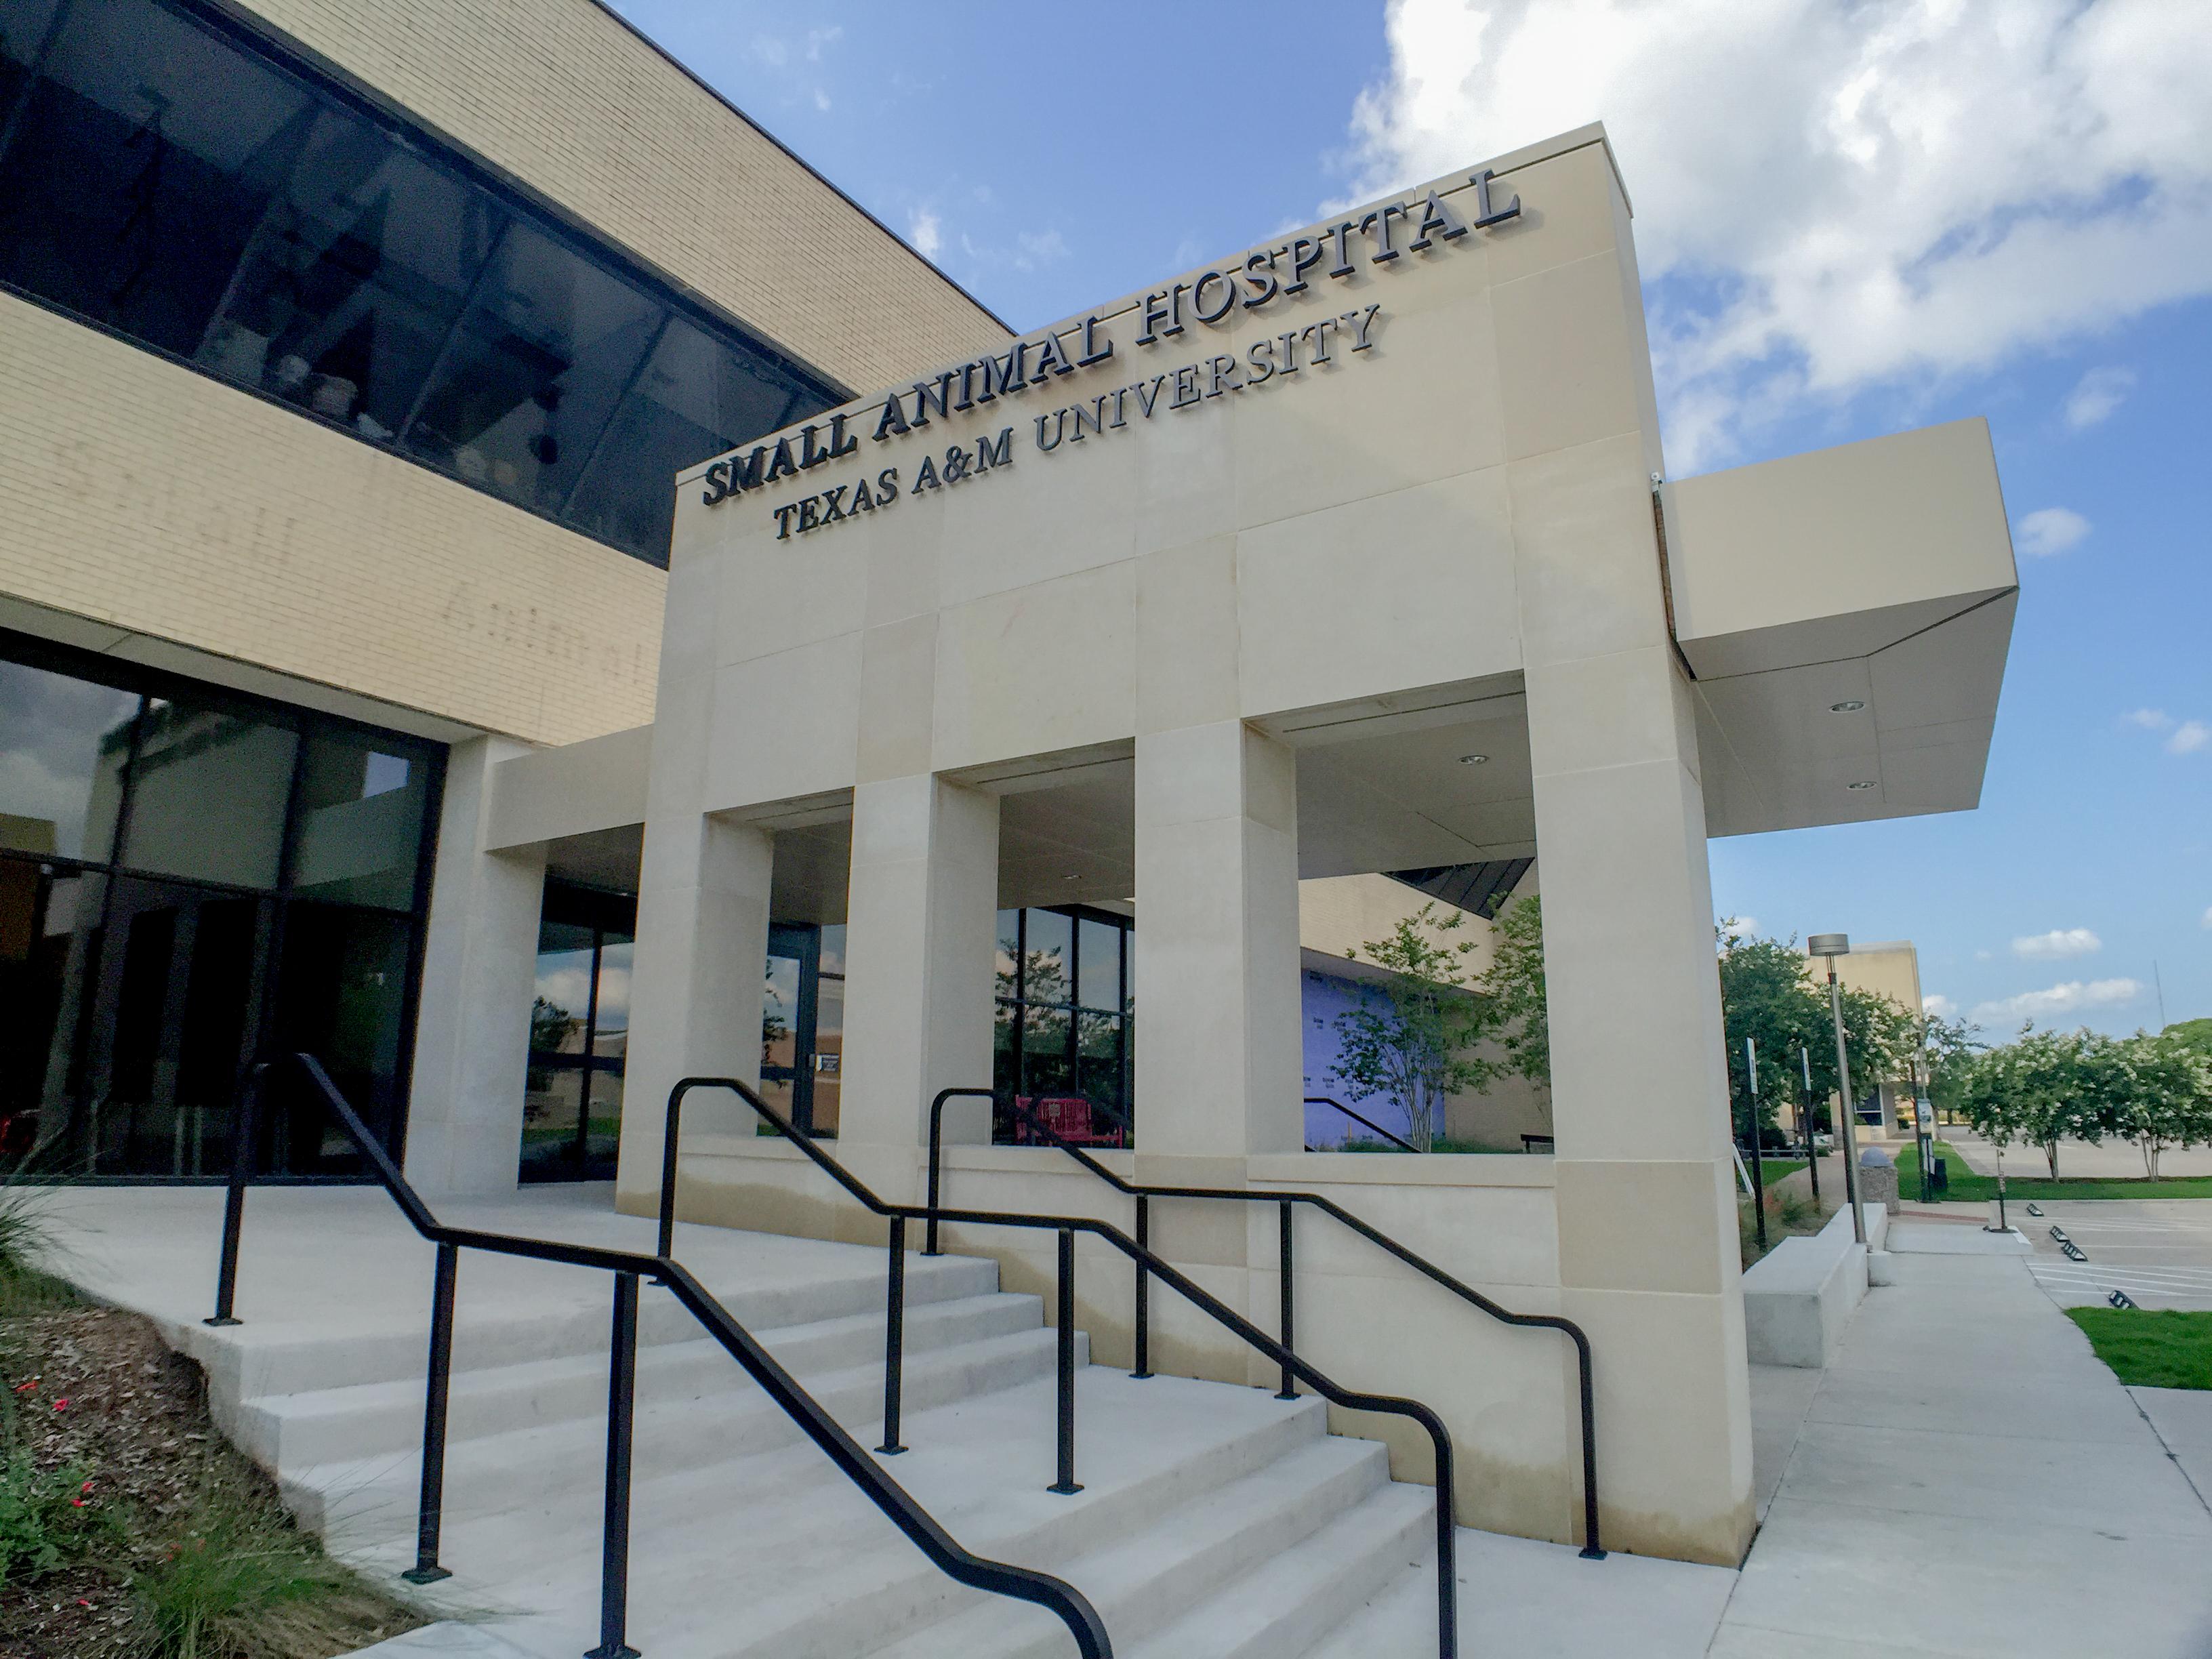 File:Small Animal Hospital